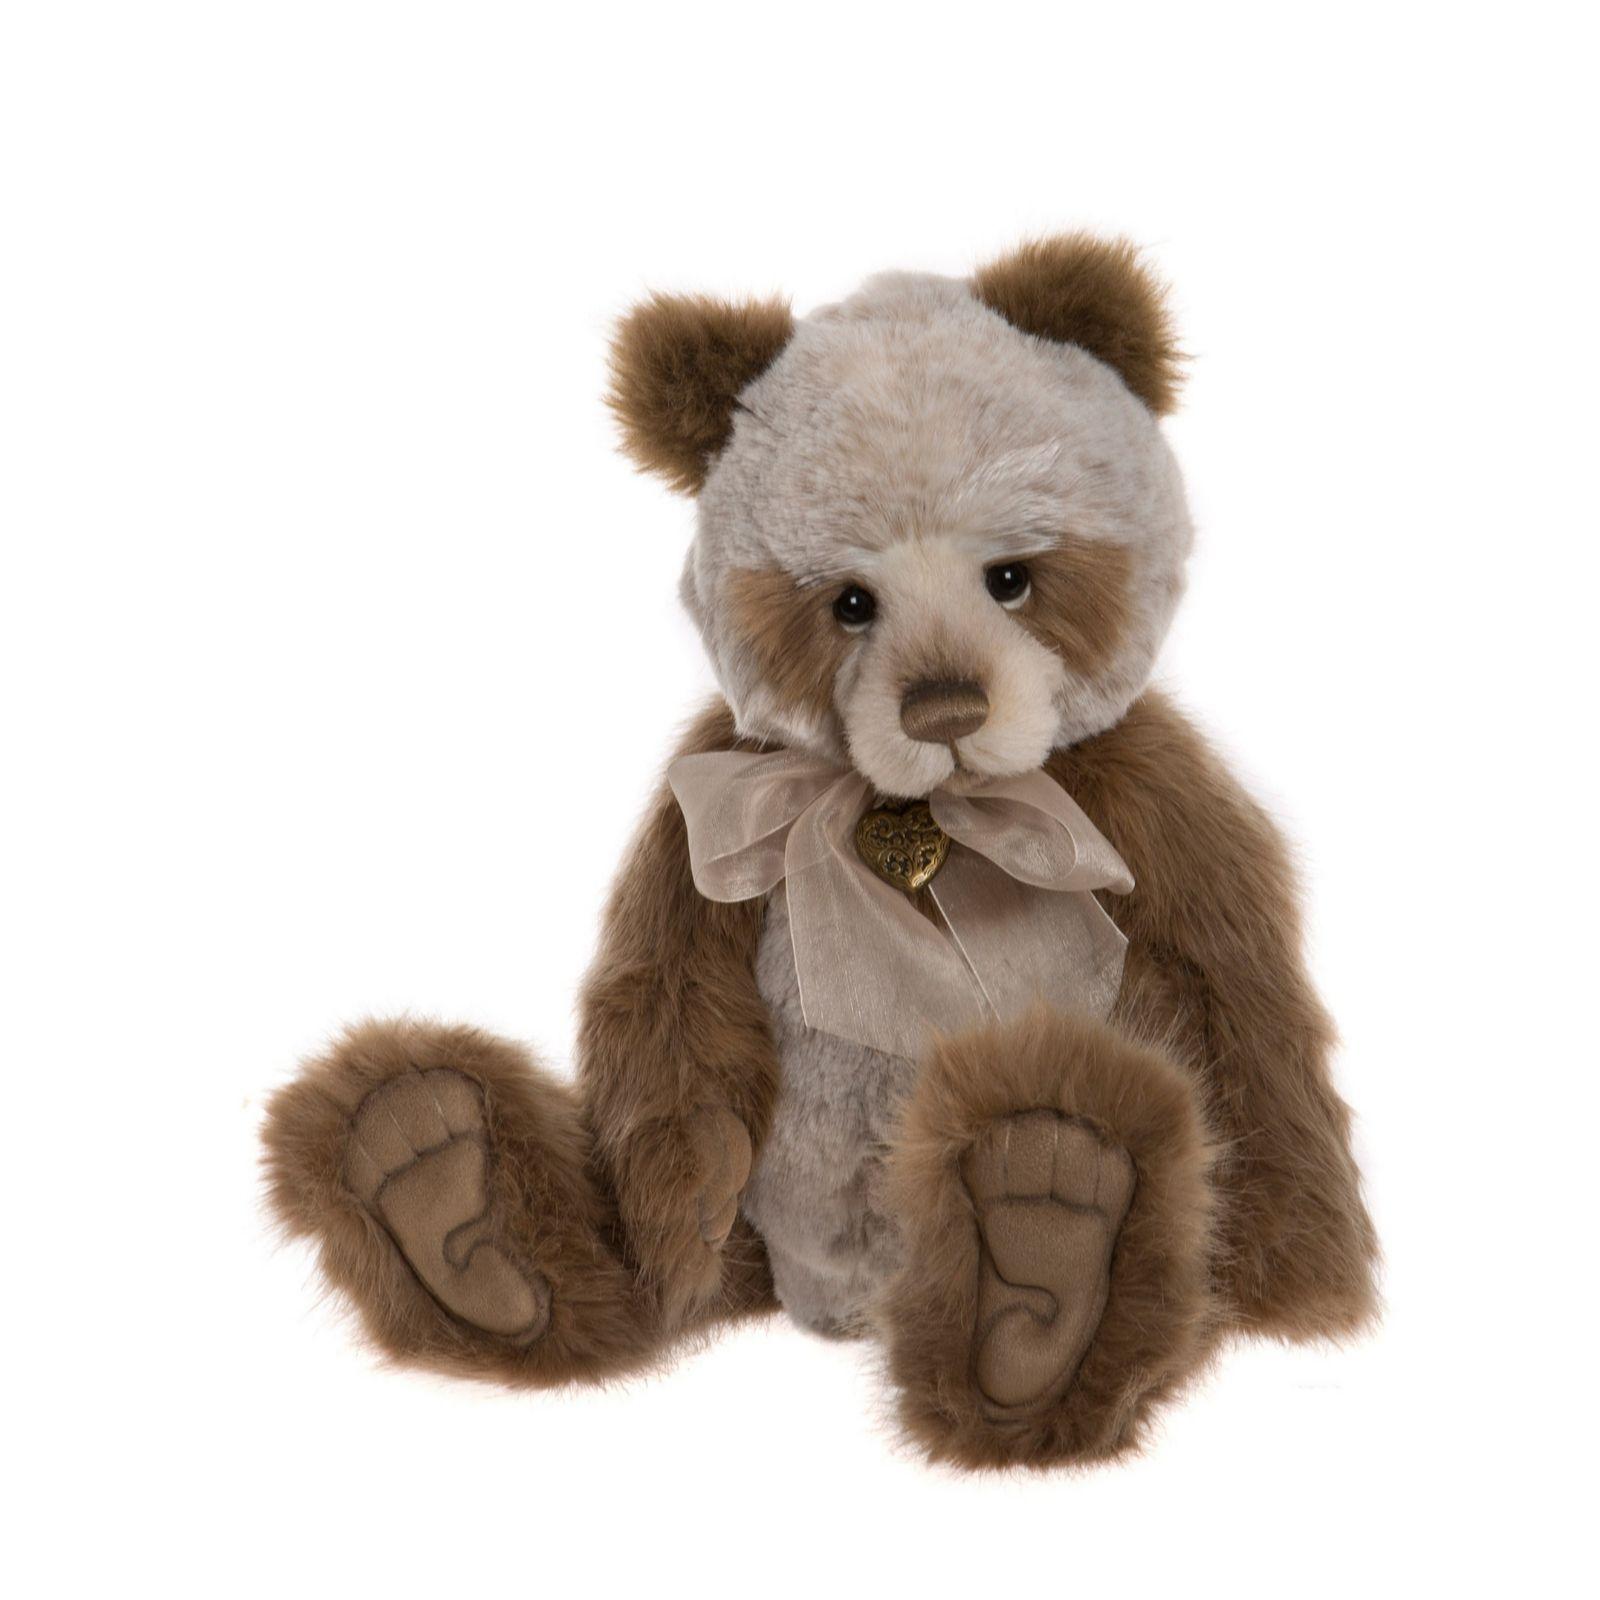 Fine Quality Bears Julian ~ Stunning Plush Bear By Charlie Bears ~ So Cute!